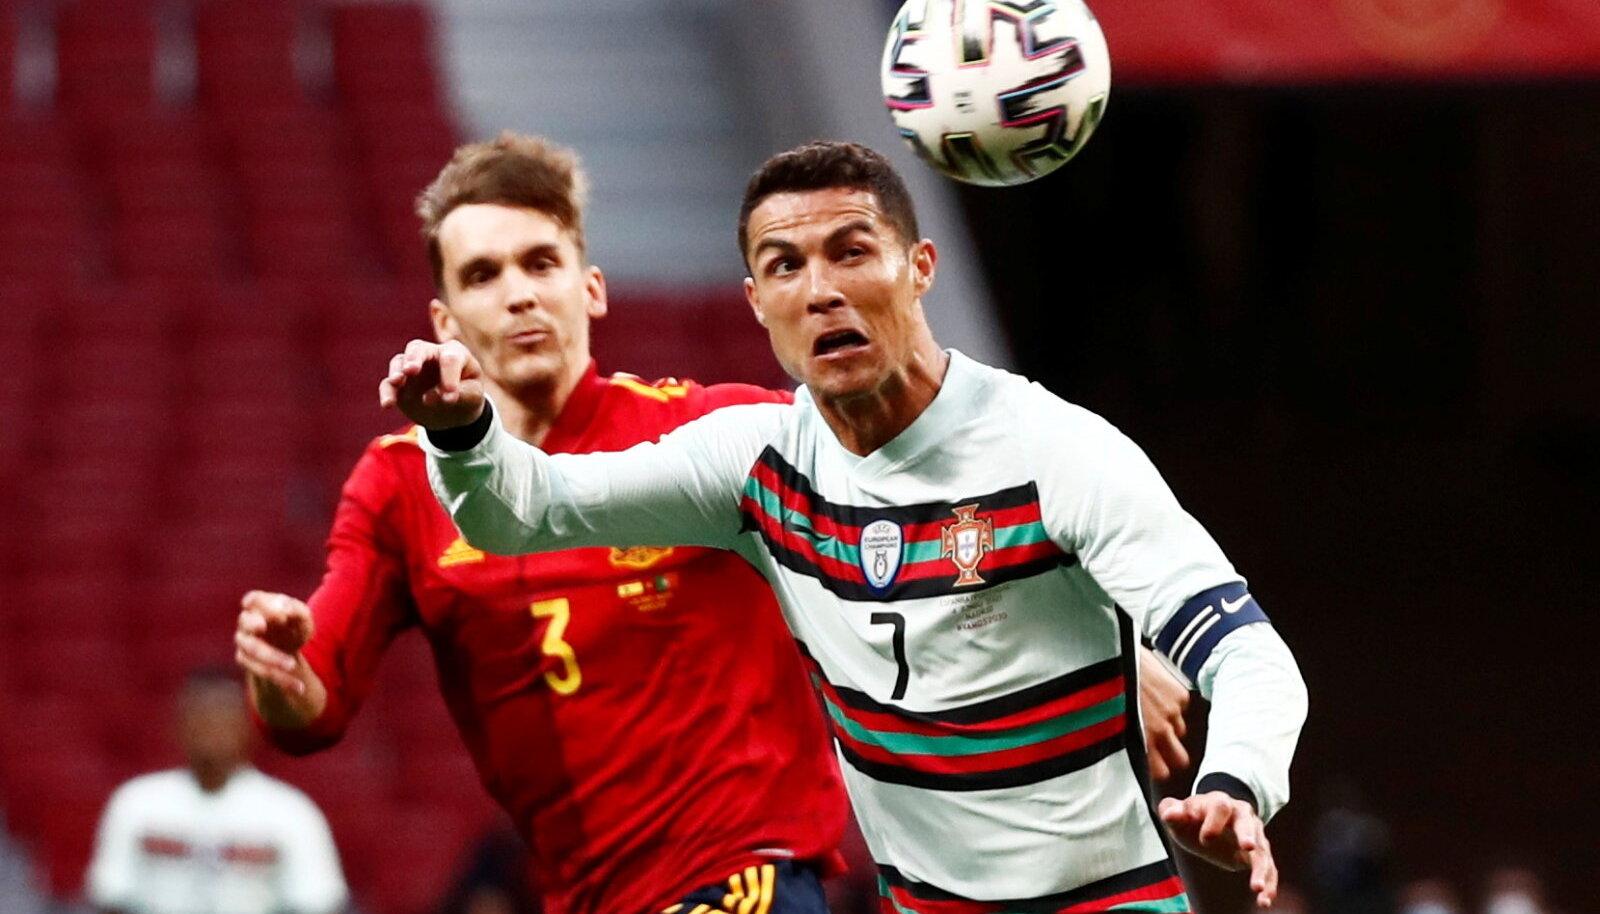 Diego Llorente ja Ronaldo